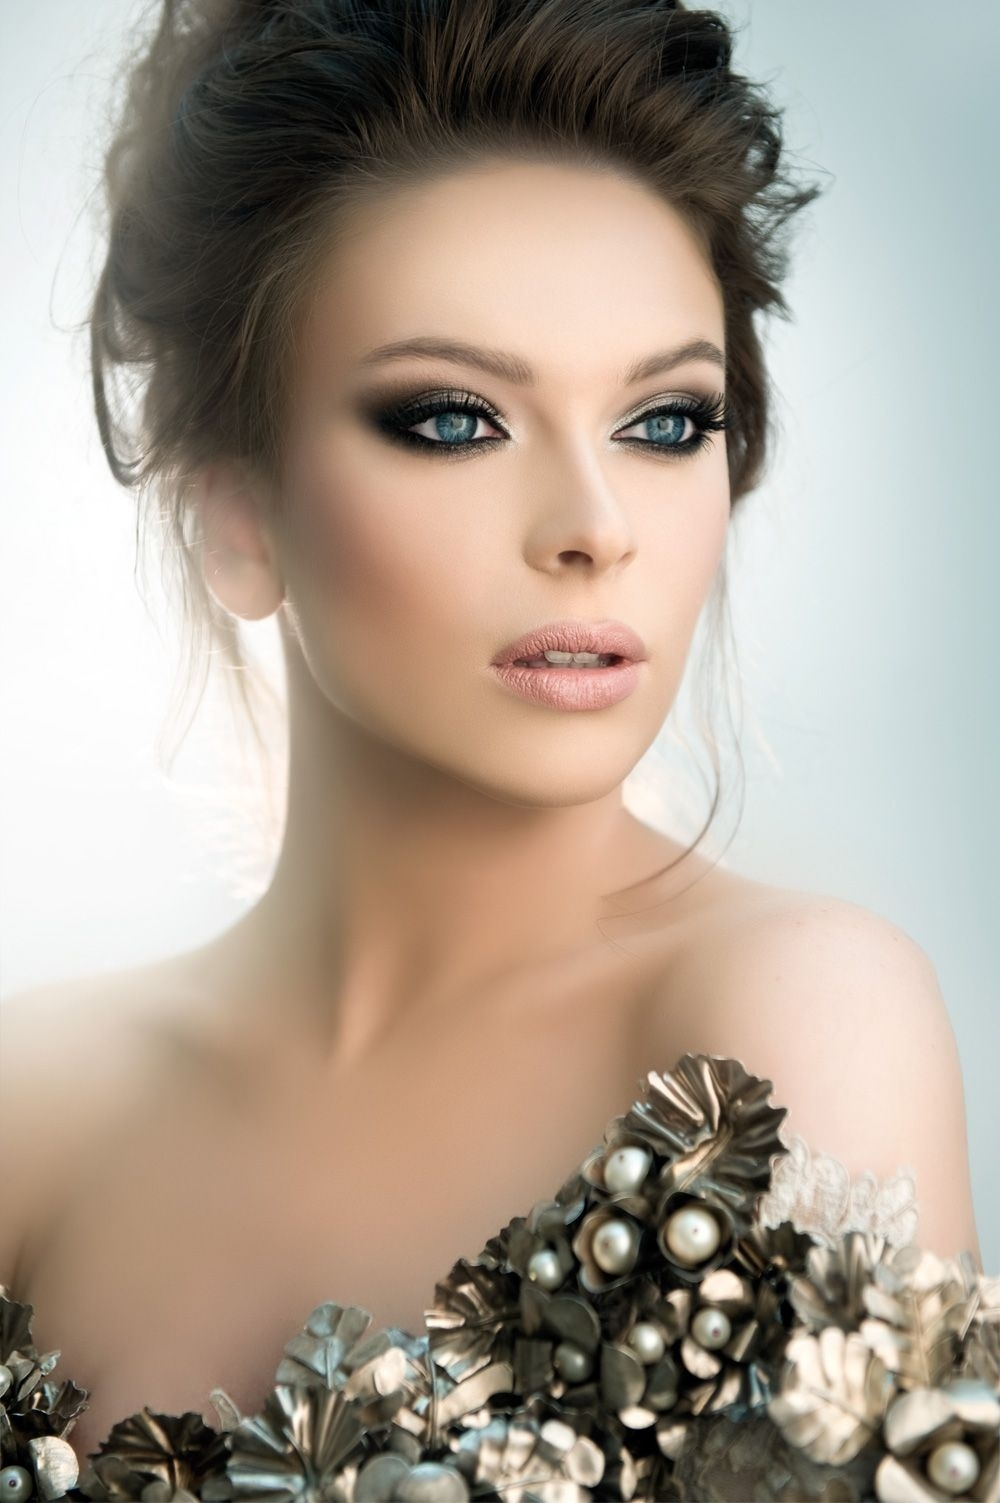 Fady Kataya - Bridal Photoshoot   Wedding Makeup   Makeup, Wedding intended for Wedding Photoshoot Makeup